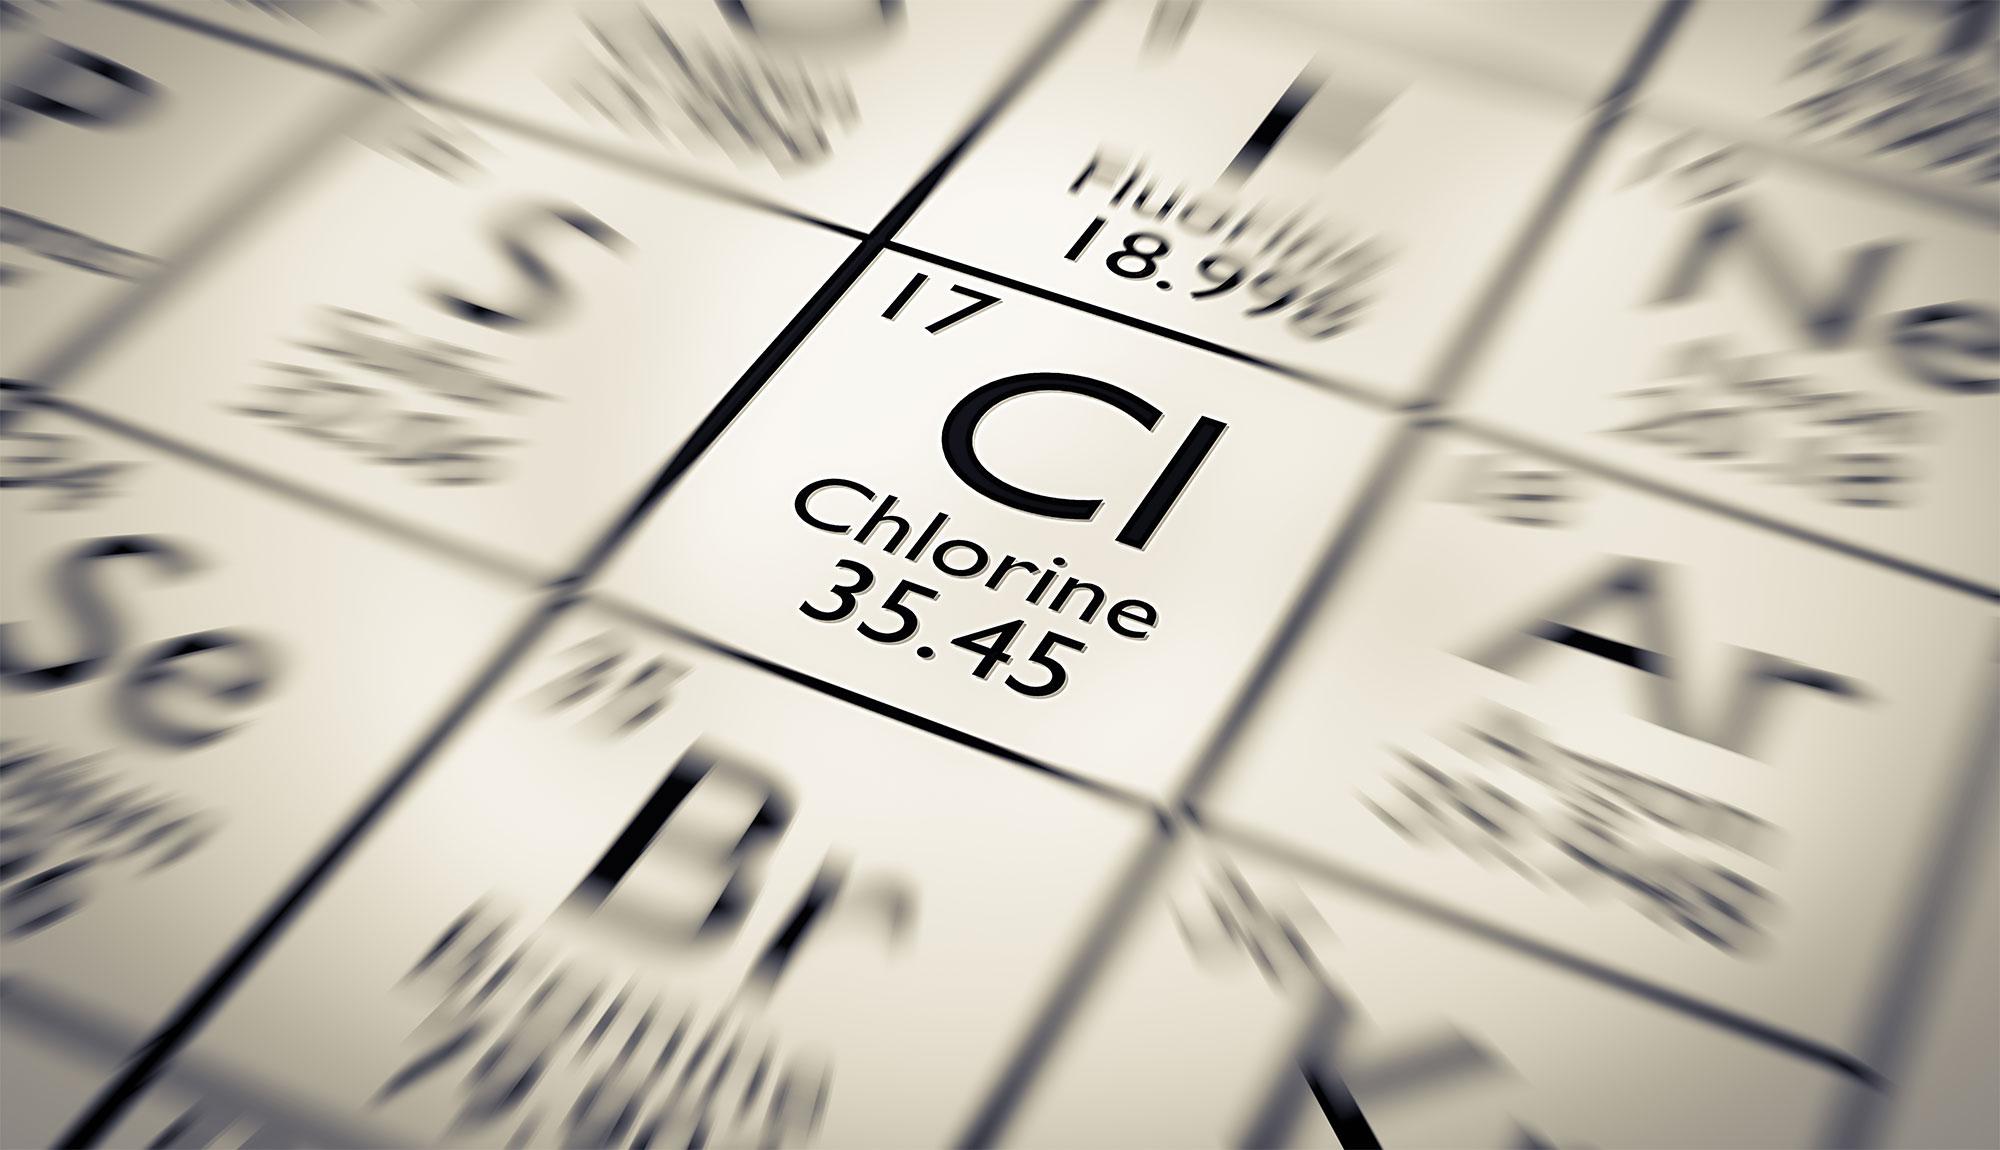 Chlorination Technical - Advanced Water Technologies